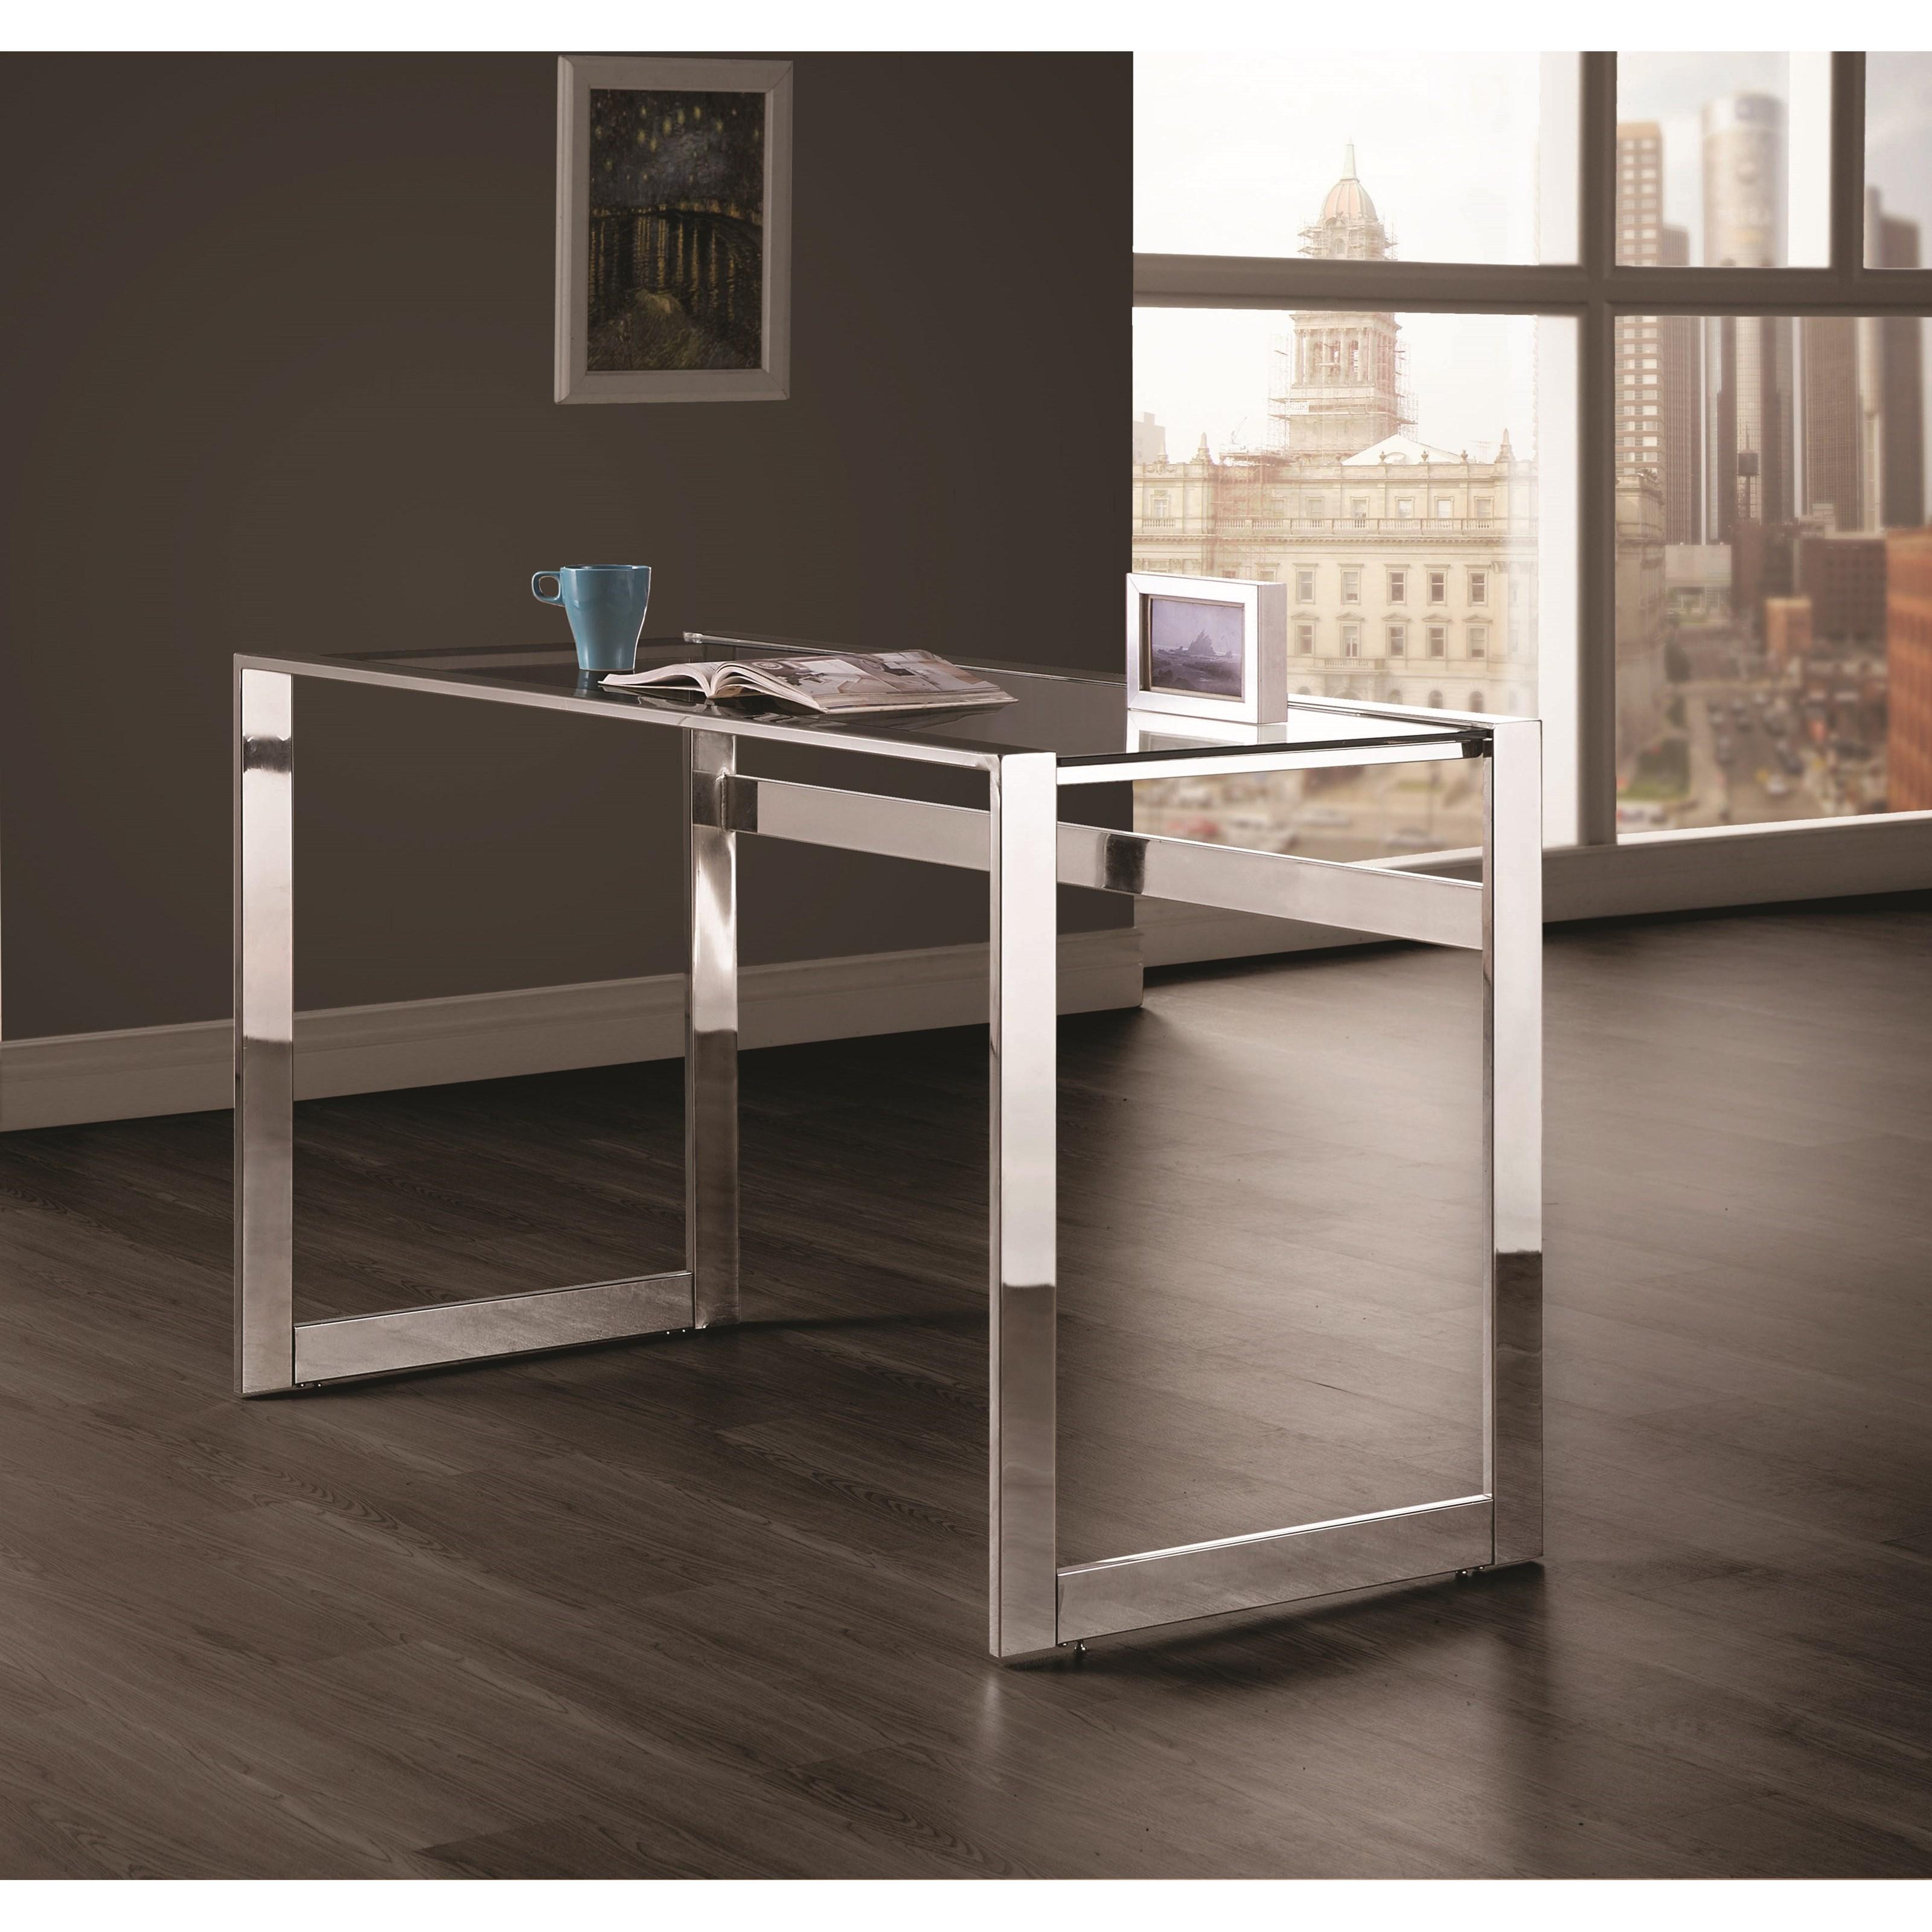 Coaster 800746 Contemporary Computer Desk With Chrome Legs